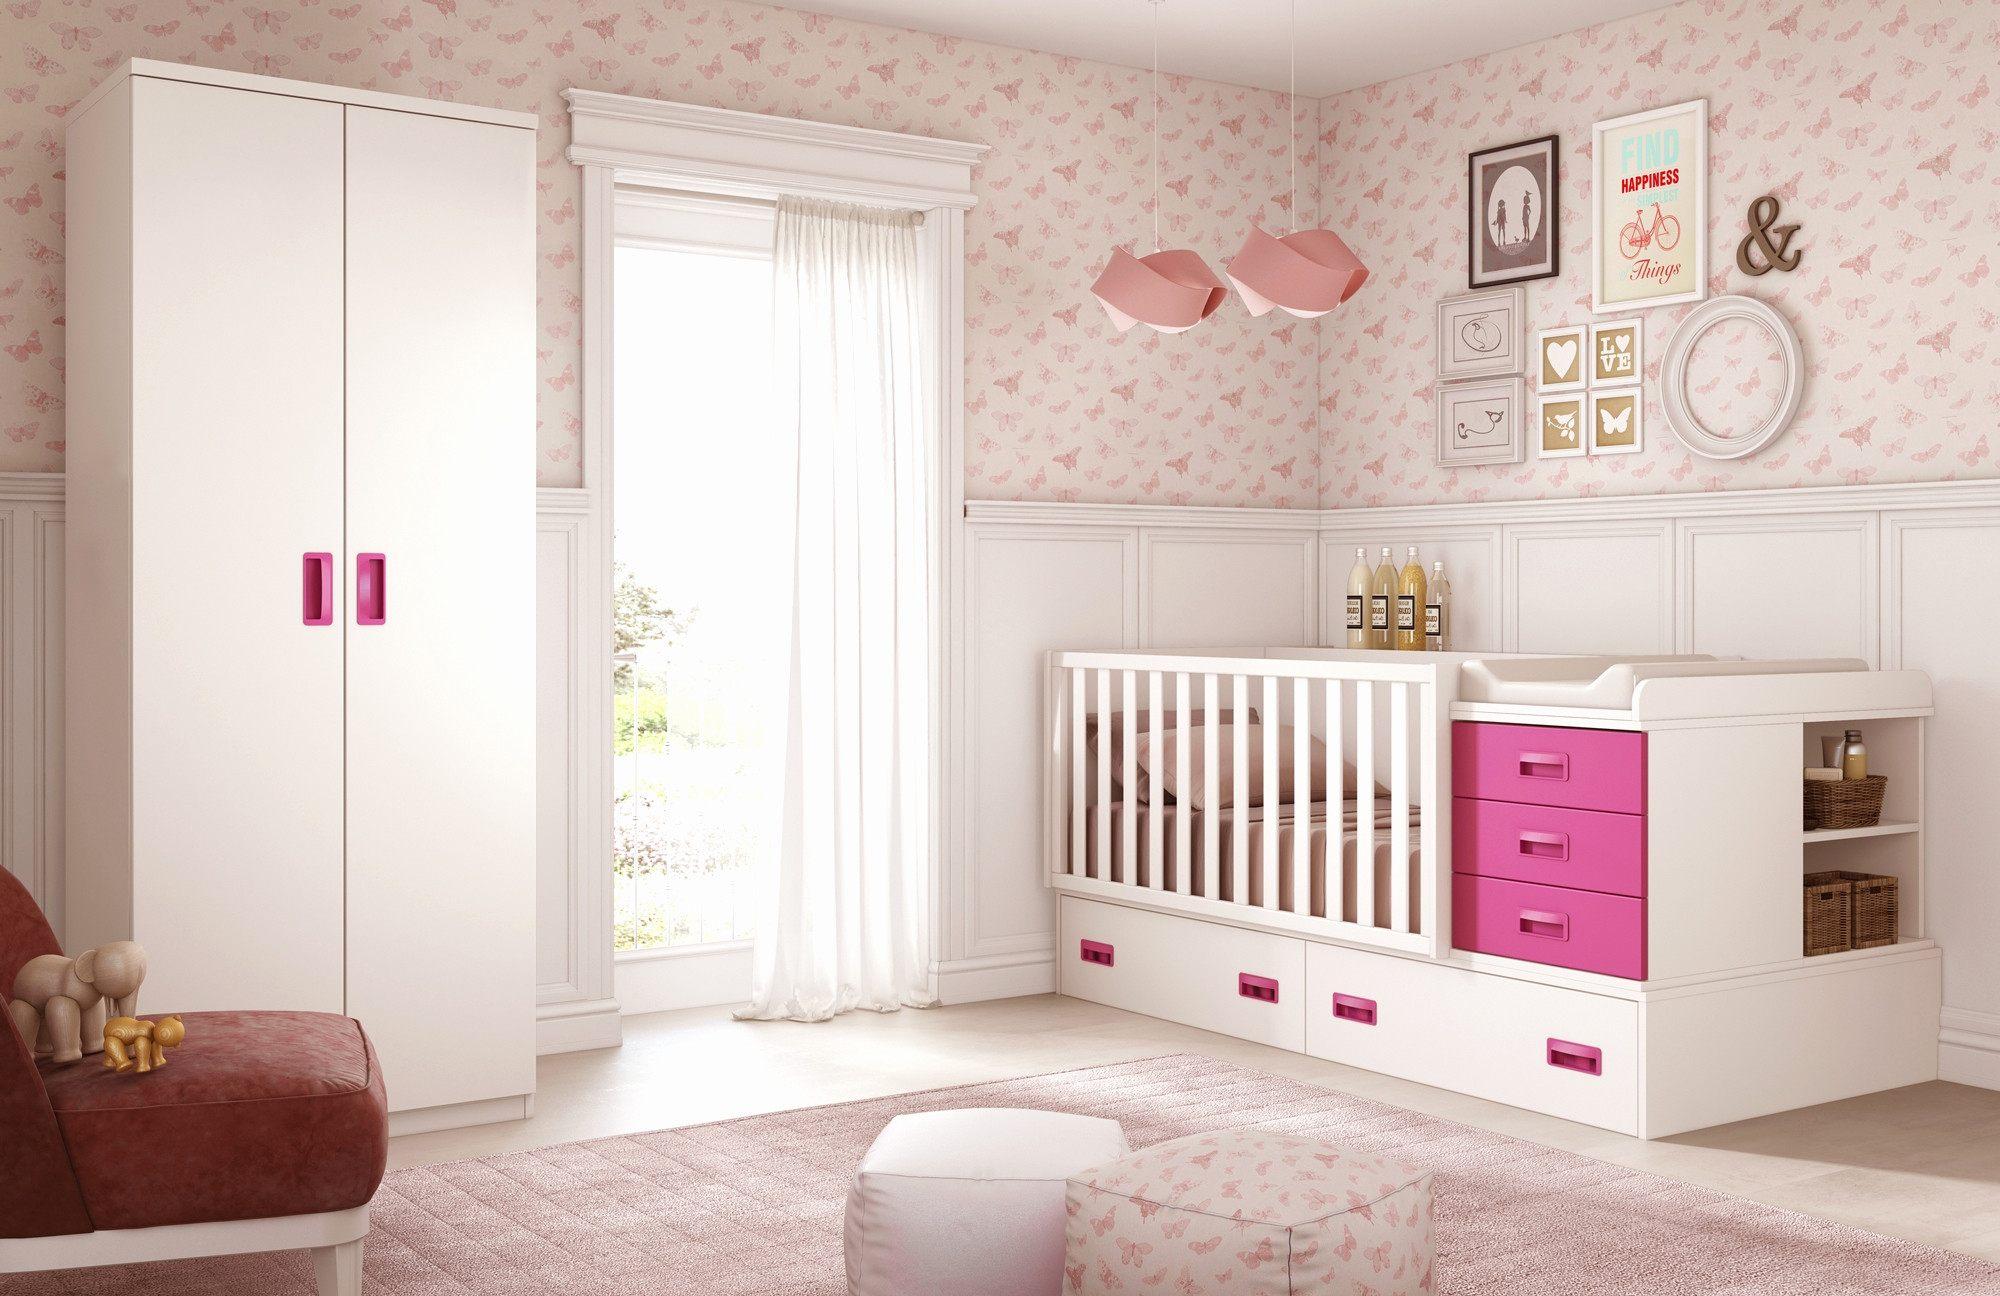 Lit Enfant Barreau Joli Lit Bebe Jusqu A Quel Age Chambre Evolutive Génial Bebe Chambre